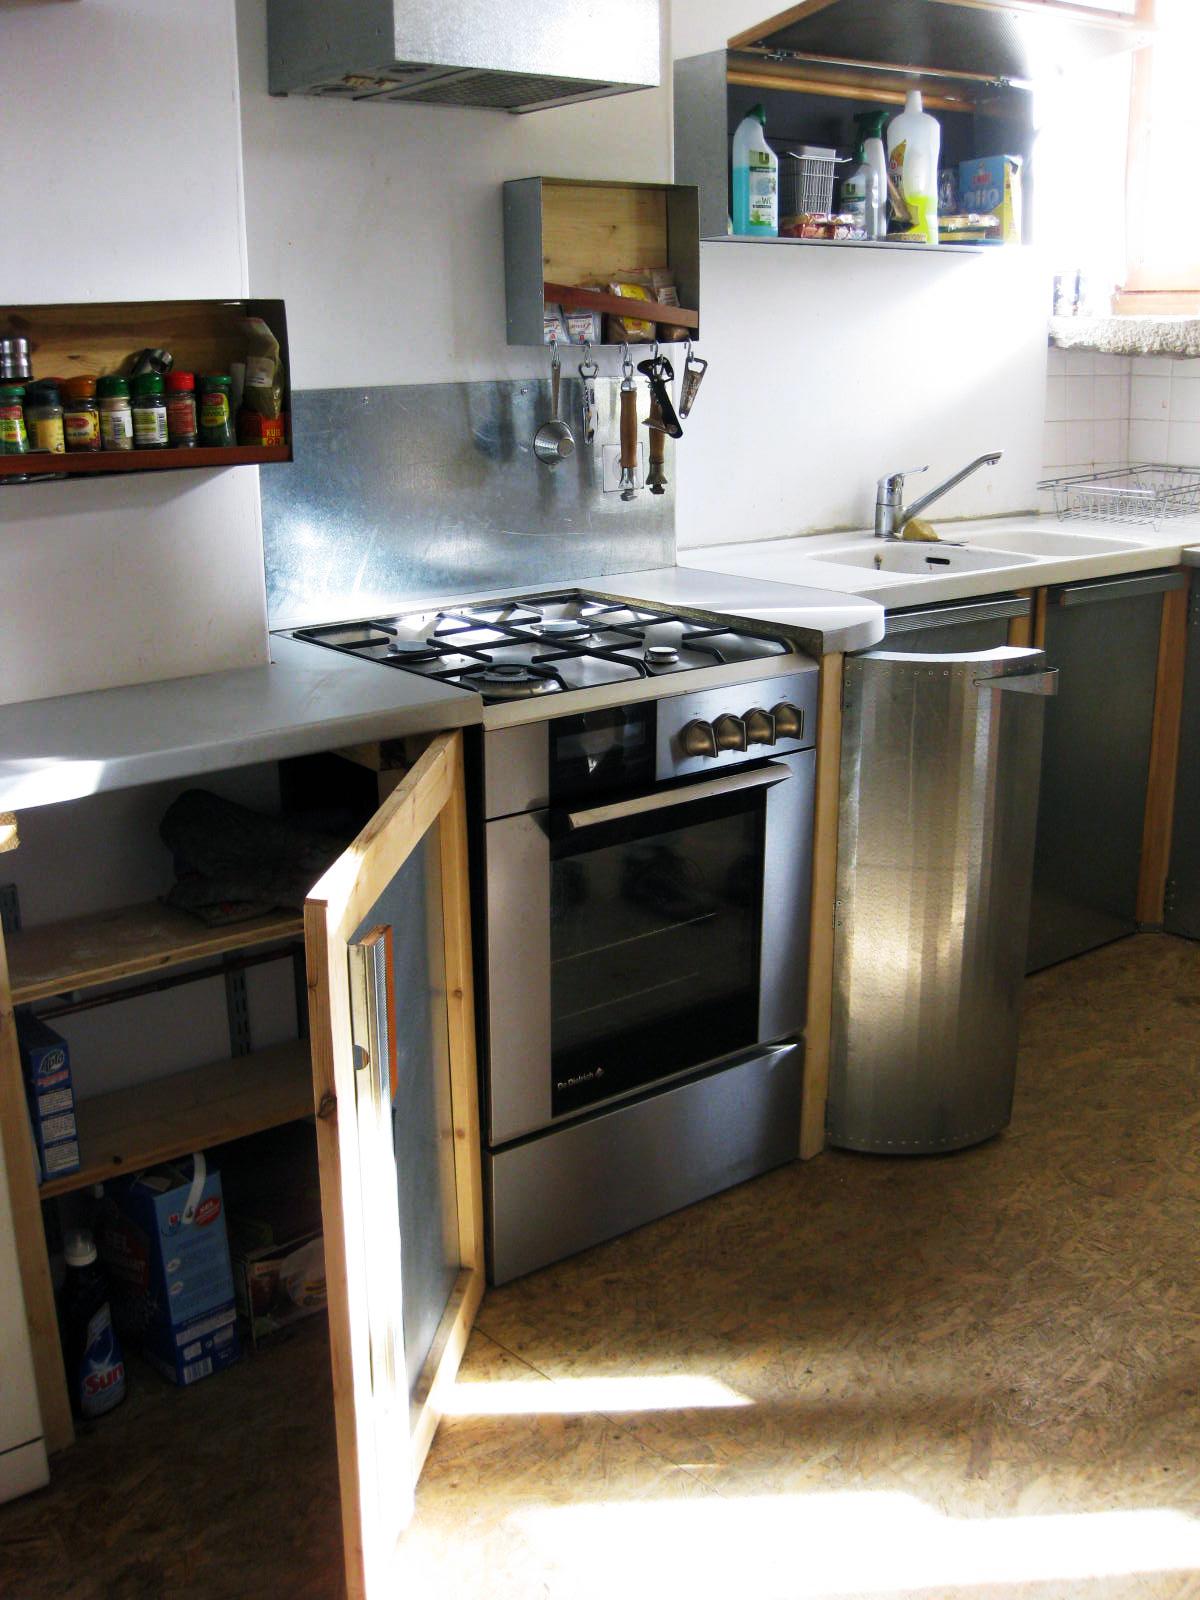 esca cuisine am nagement int rieur. Black Bedroom Furniture Sets. Home Design Ideas